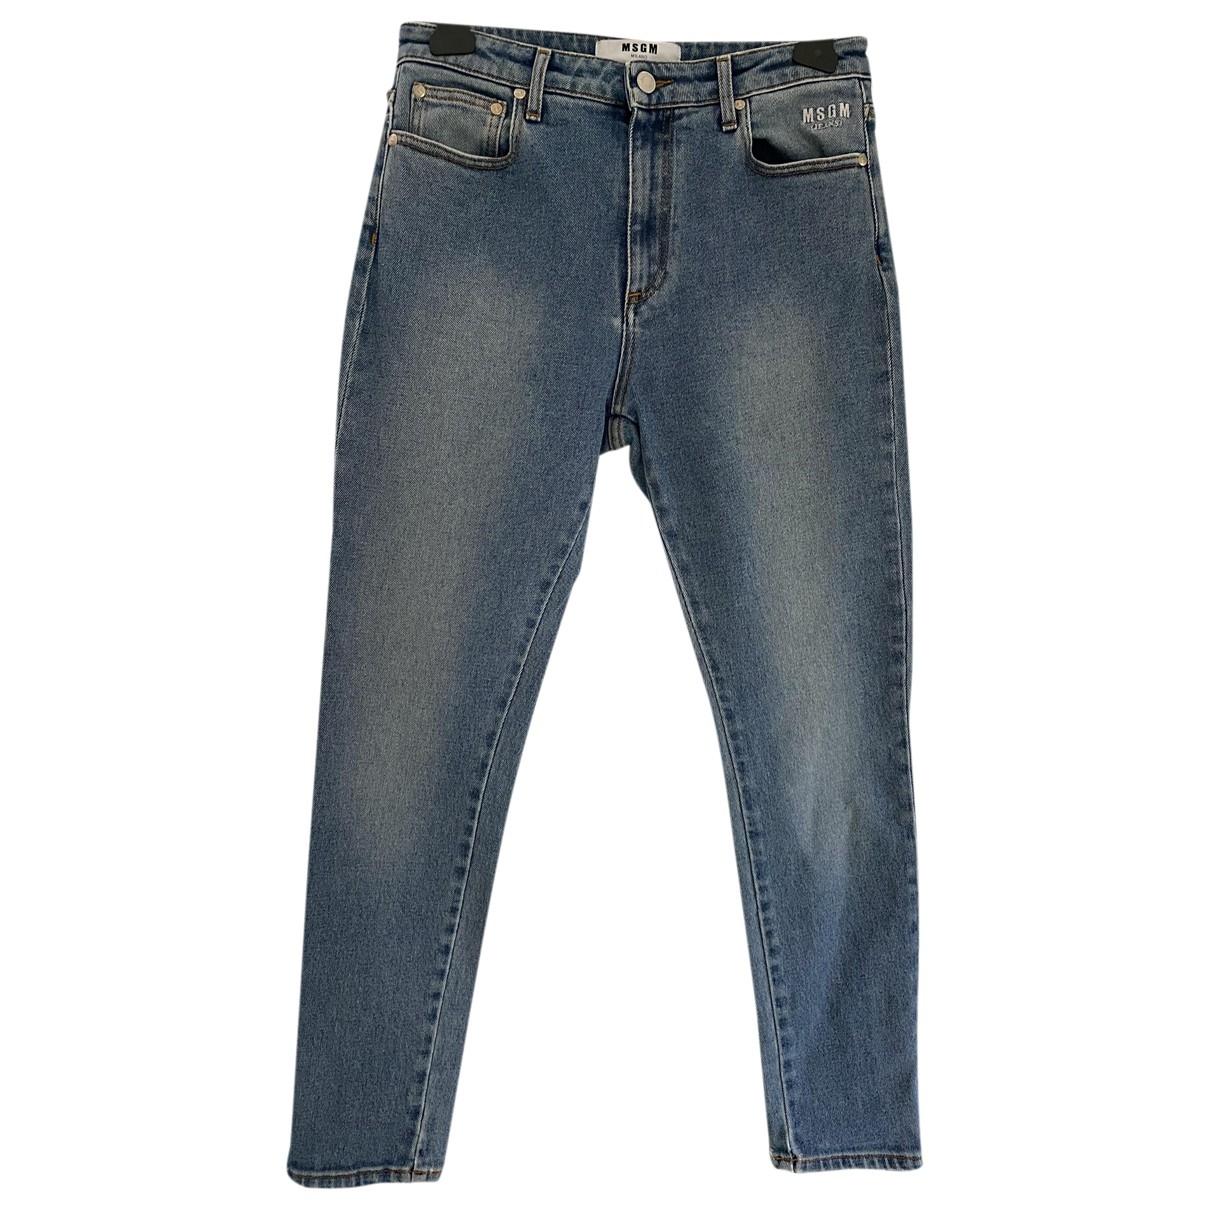 Msgm \N Blue Denim - Jeans Trousers for Women 44 IT